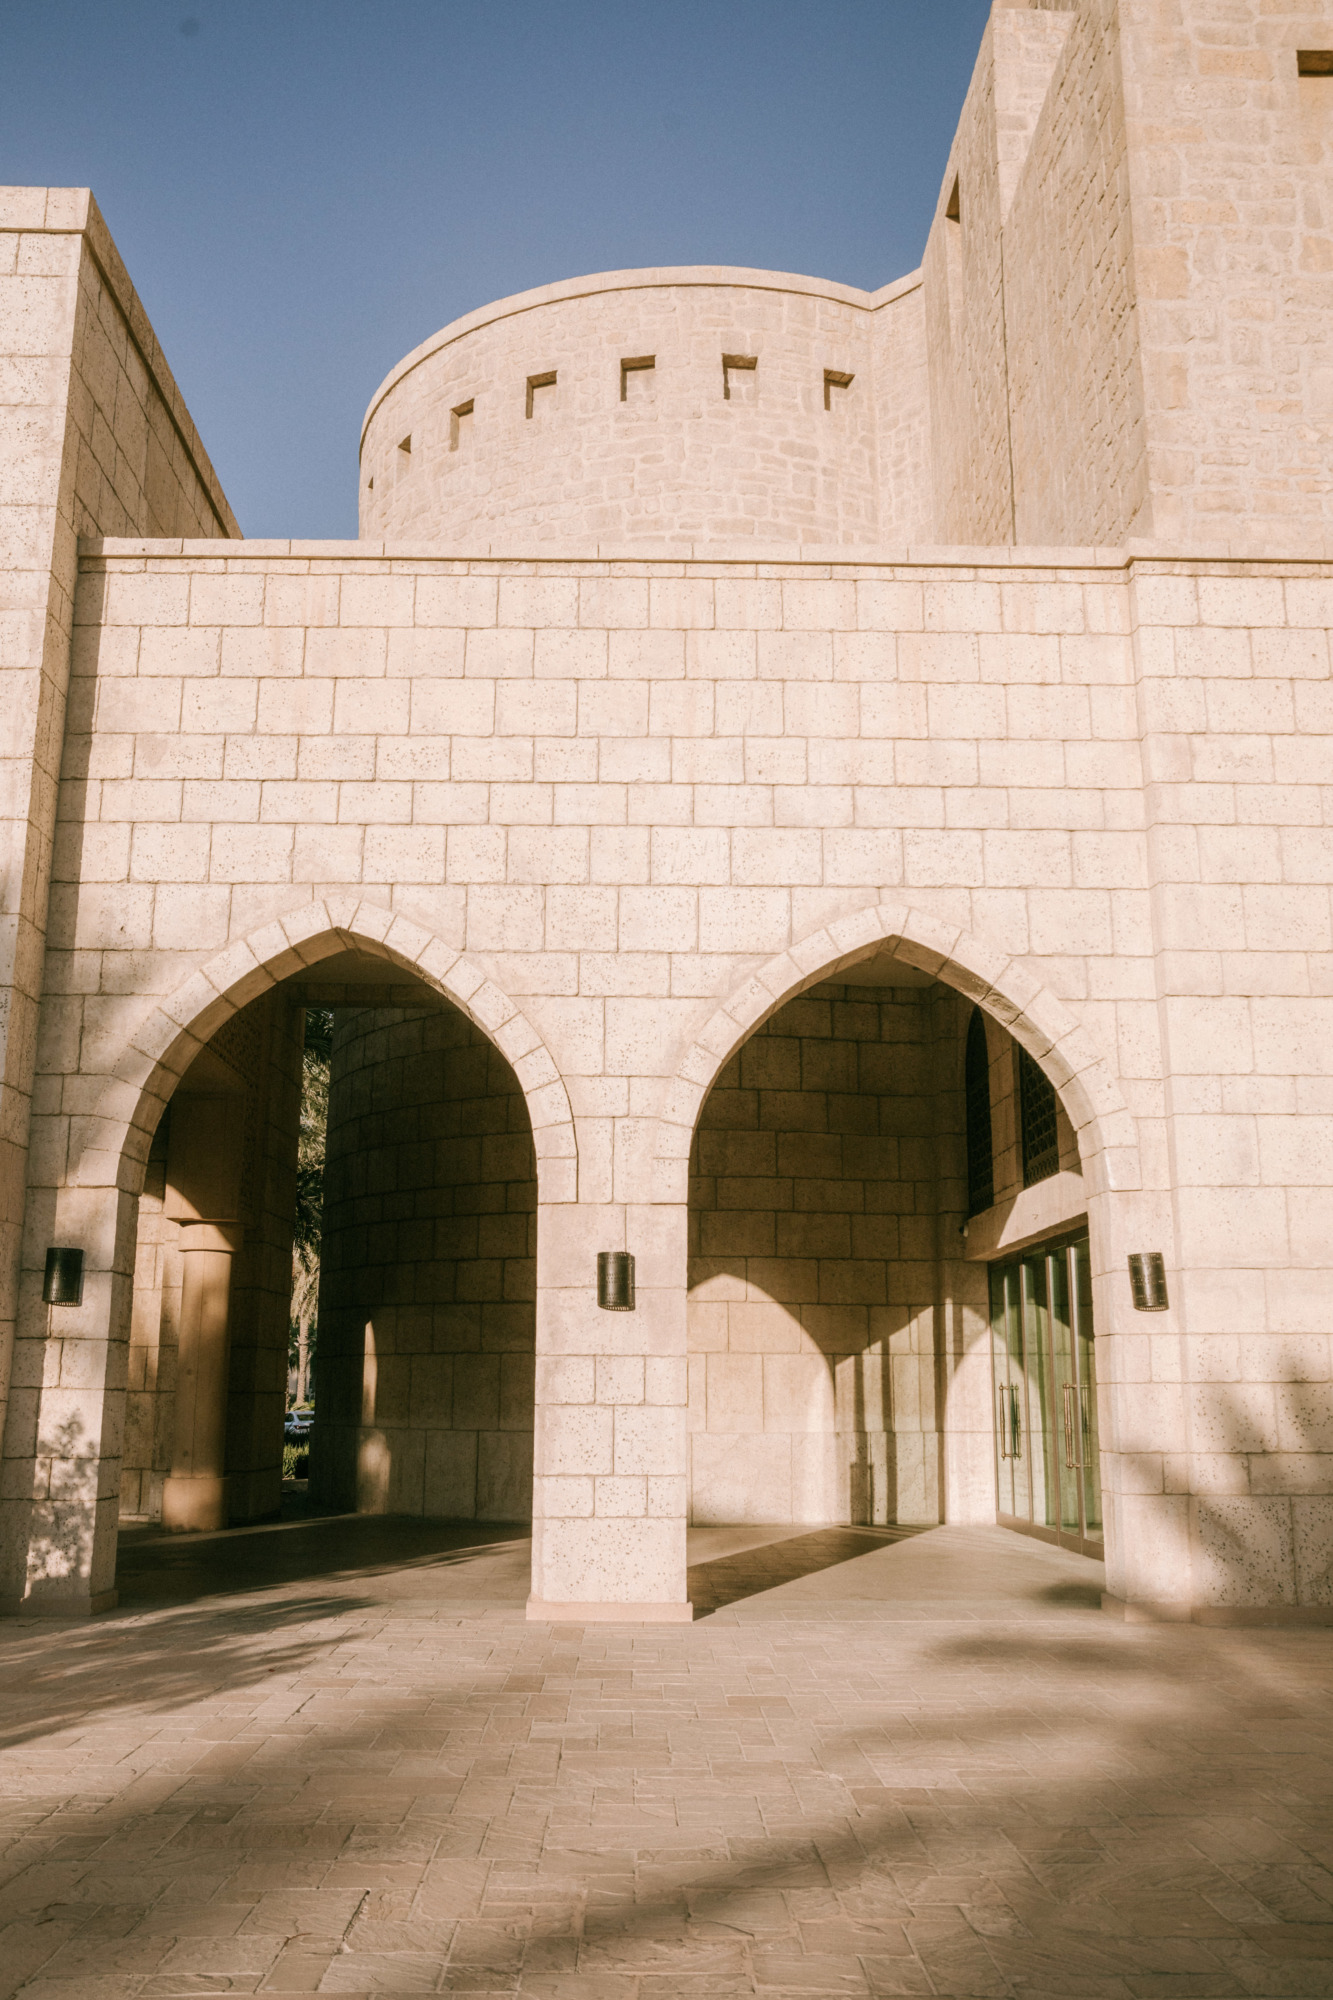 Visiter Dubaï - Blondie Baby blog voyages